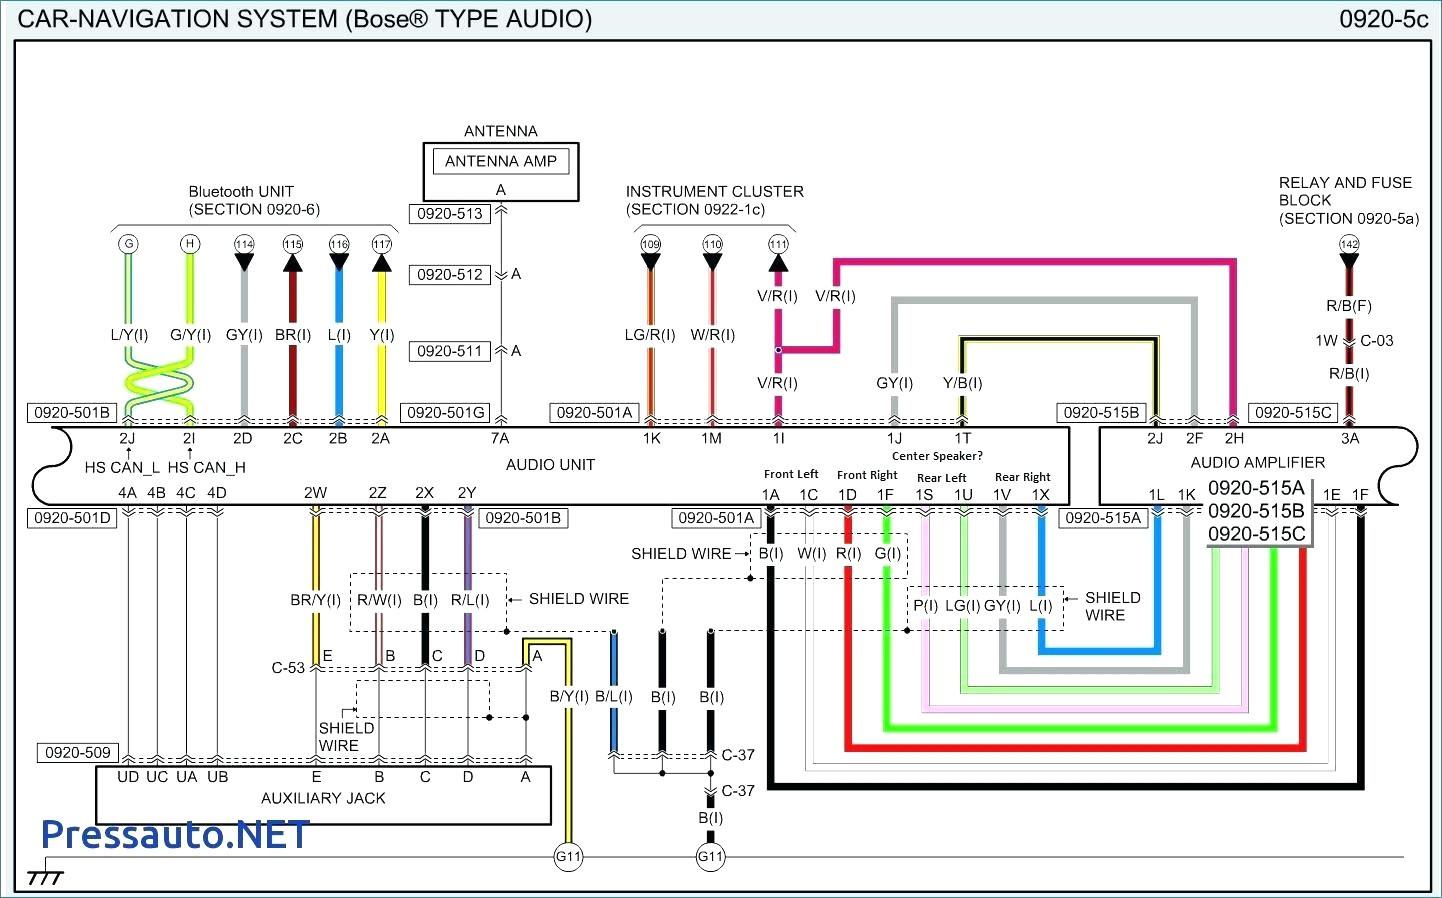 2005 Chrysler Sebring Stereo Wiring Diagram - Wiring Diagram